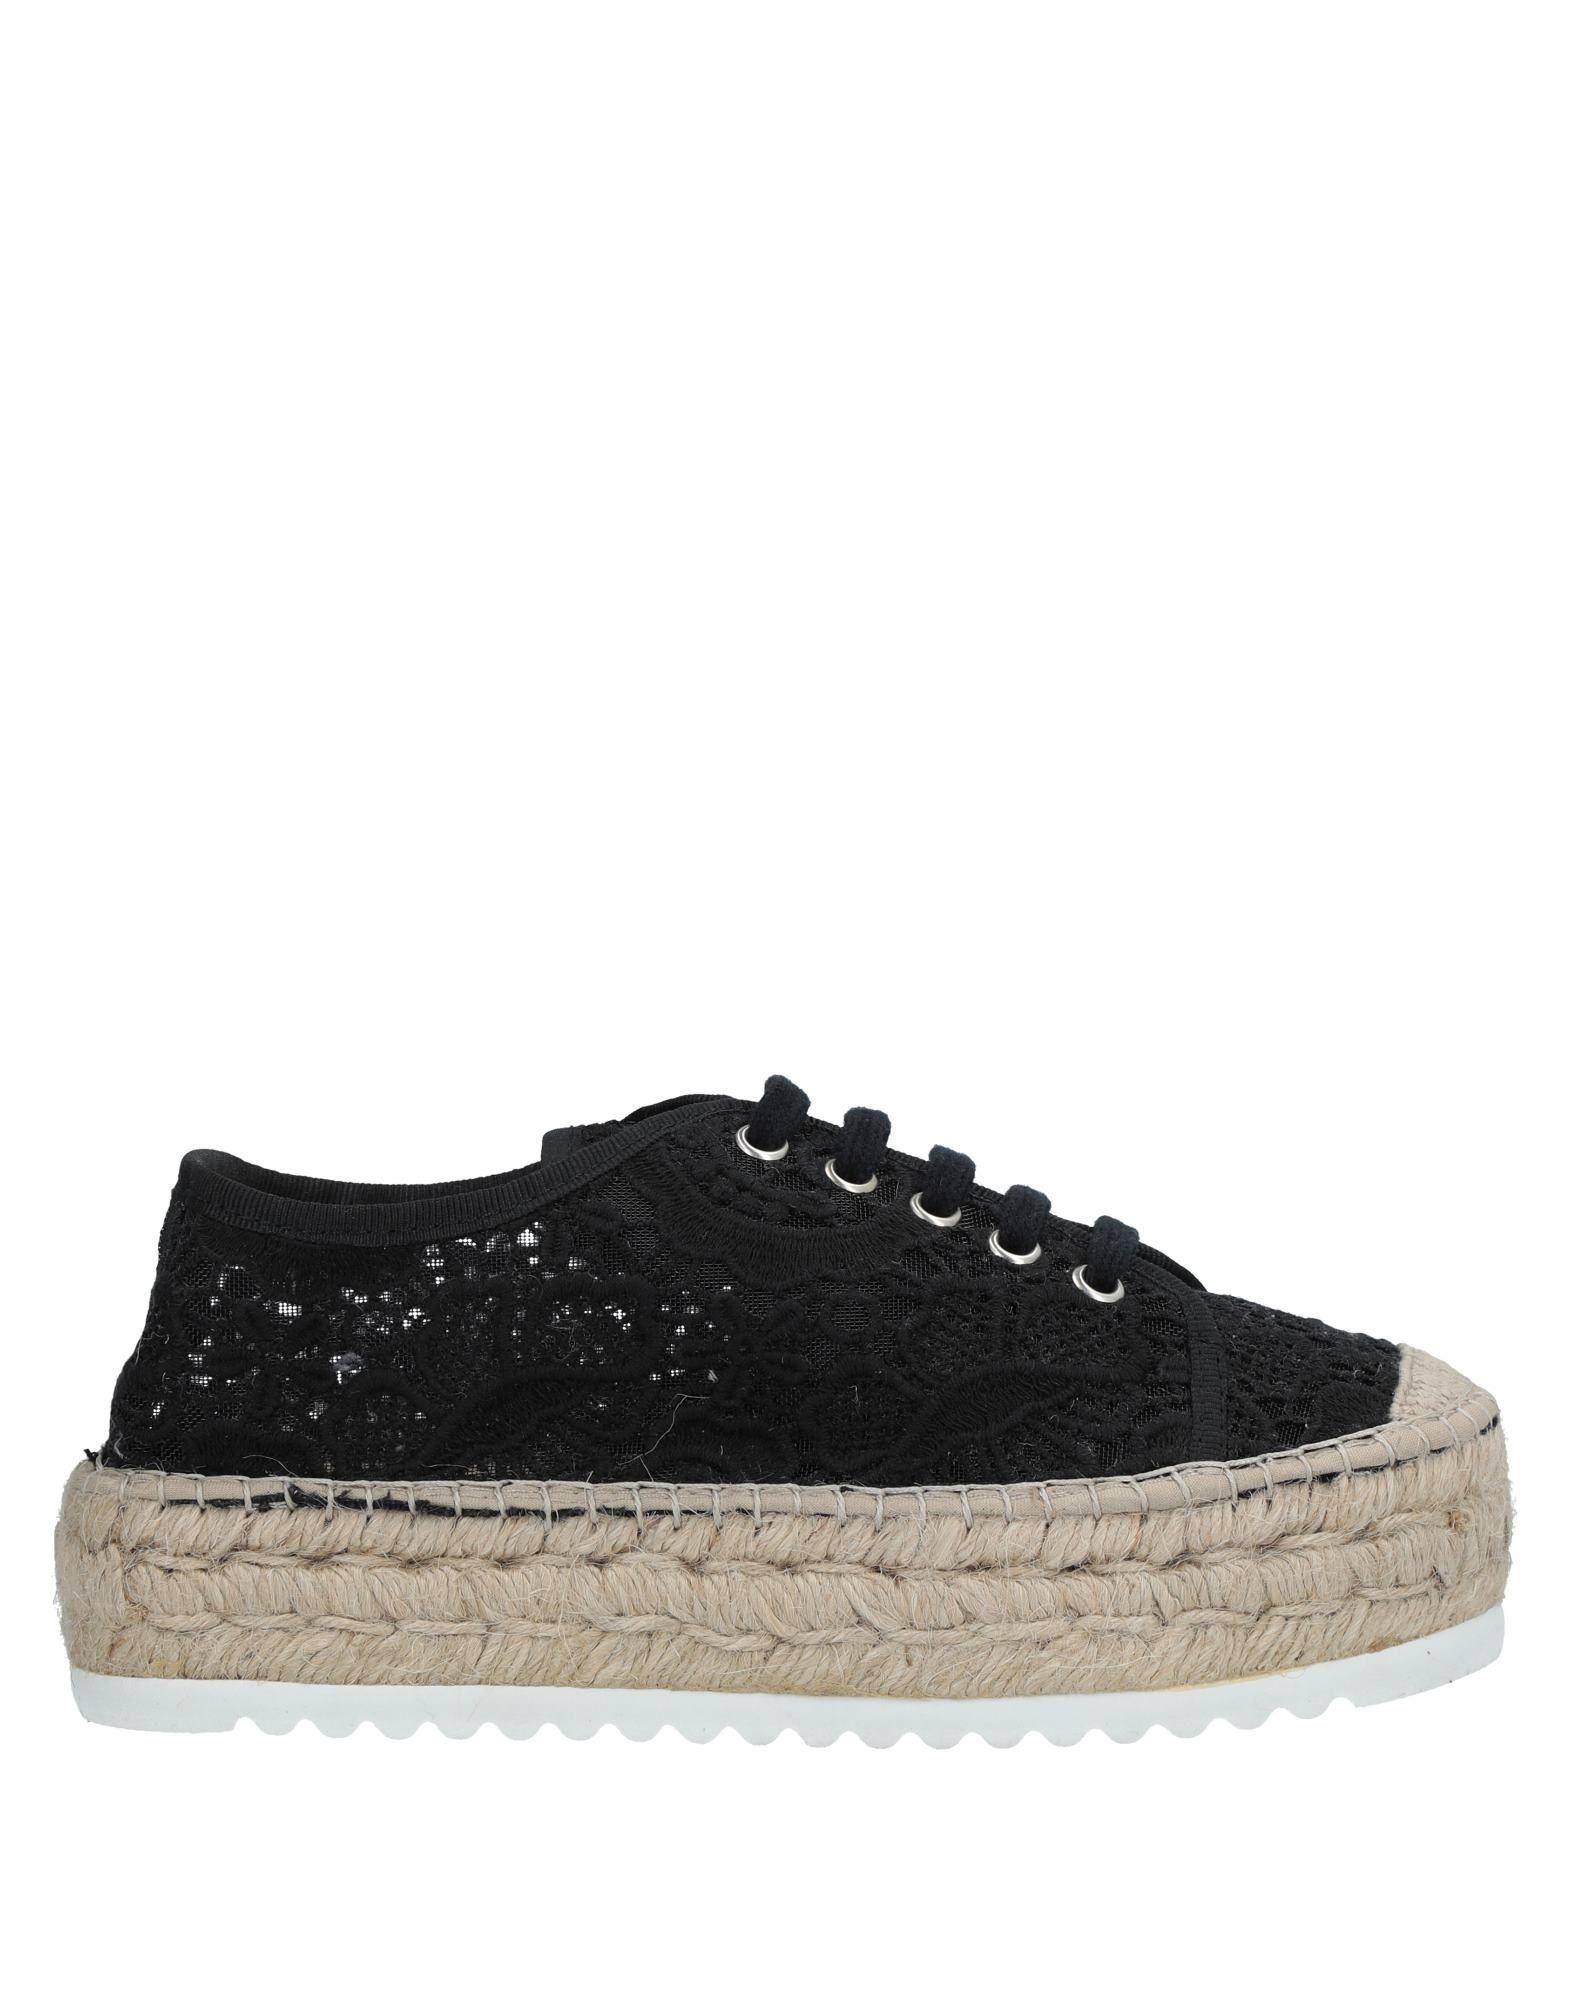 Vidorreta Espadrilles Damen beliebte  11533710SK Gute Qualität beliebte Damen Schuhe 9c0e47